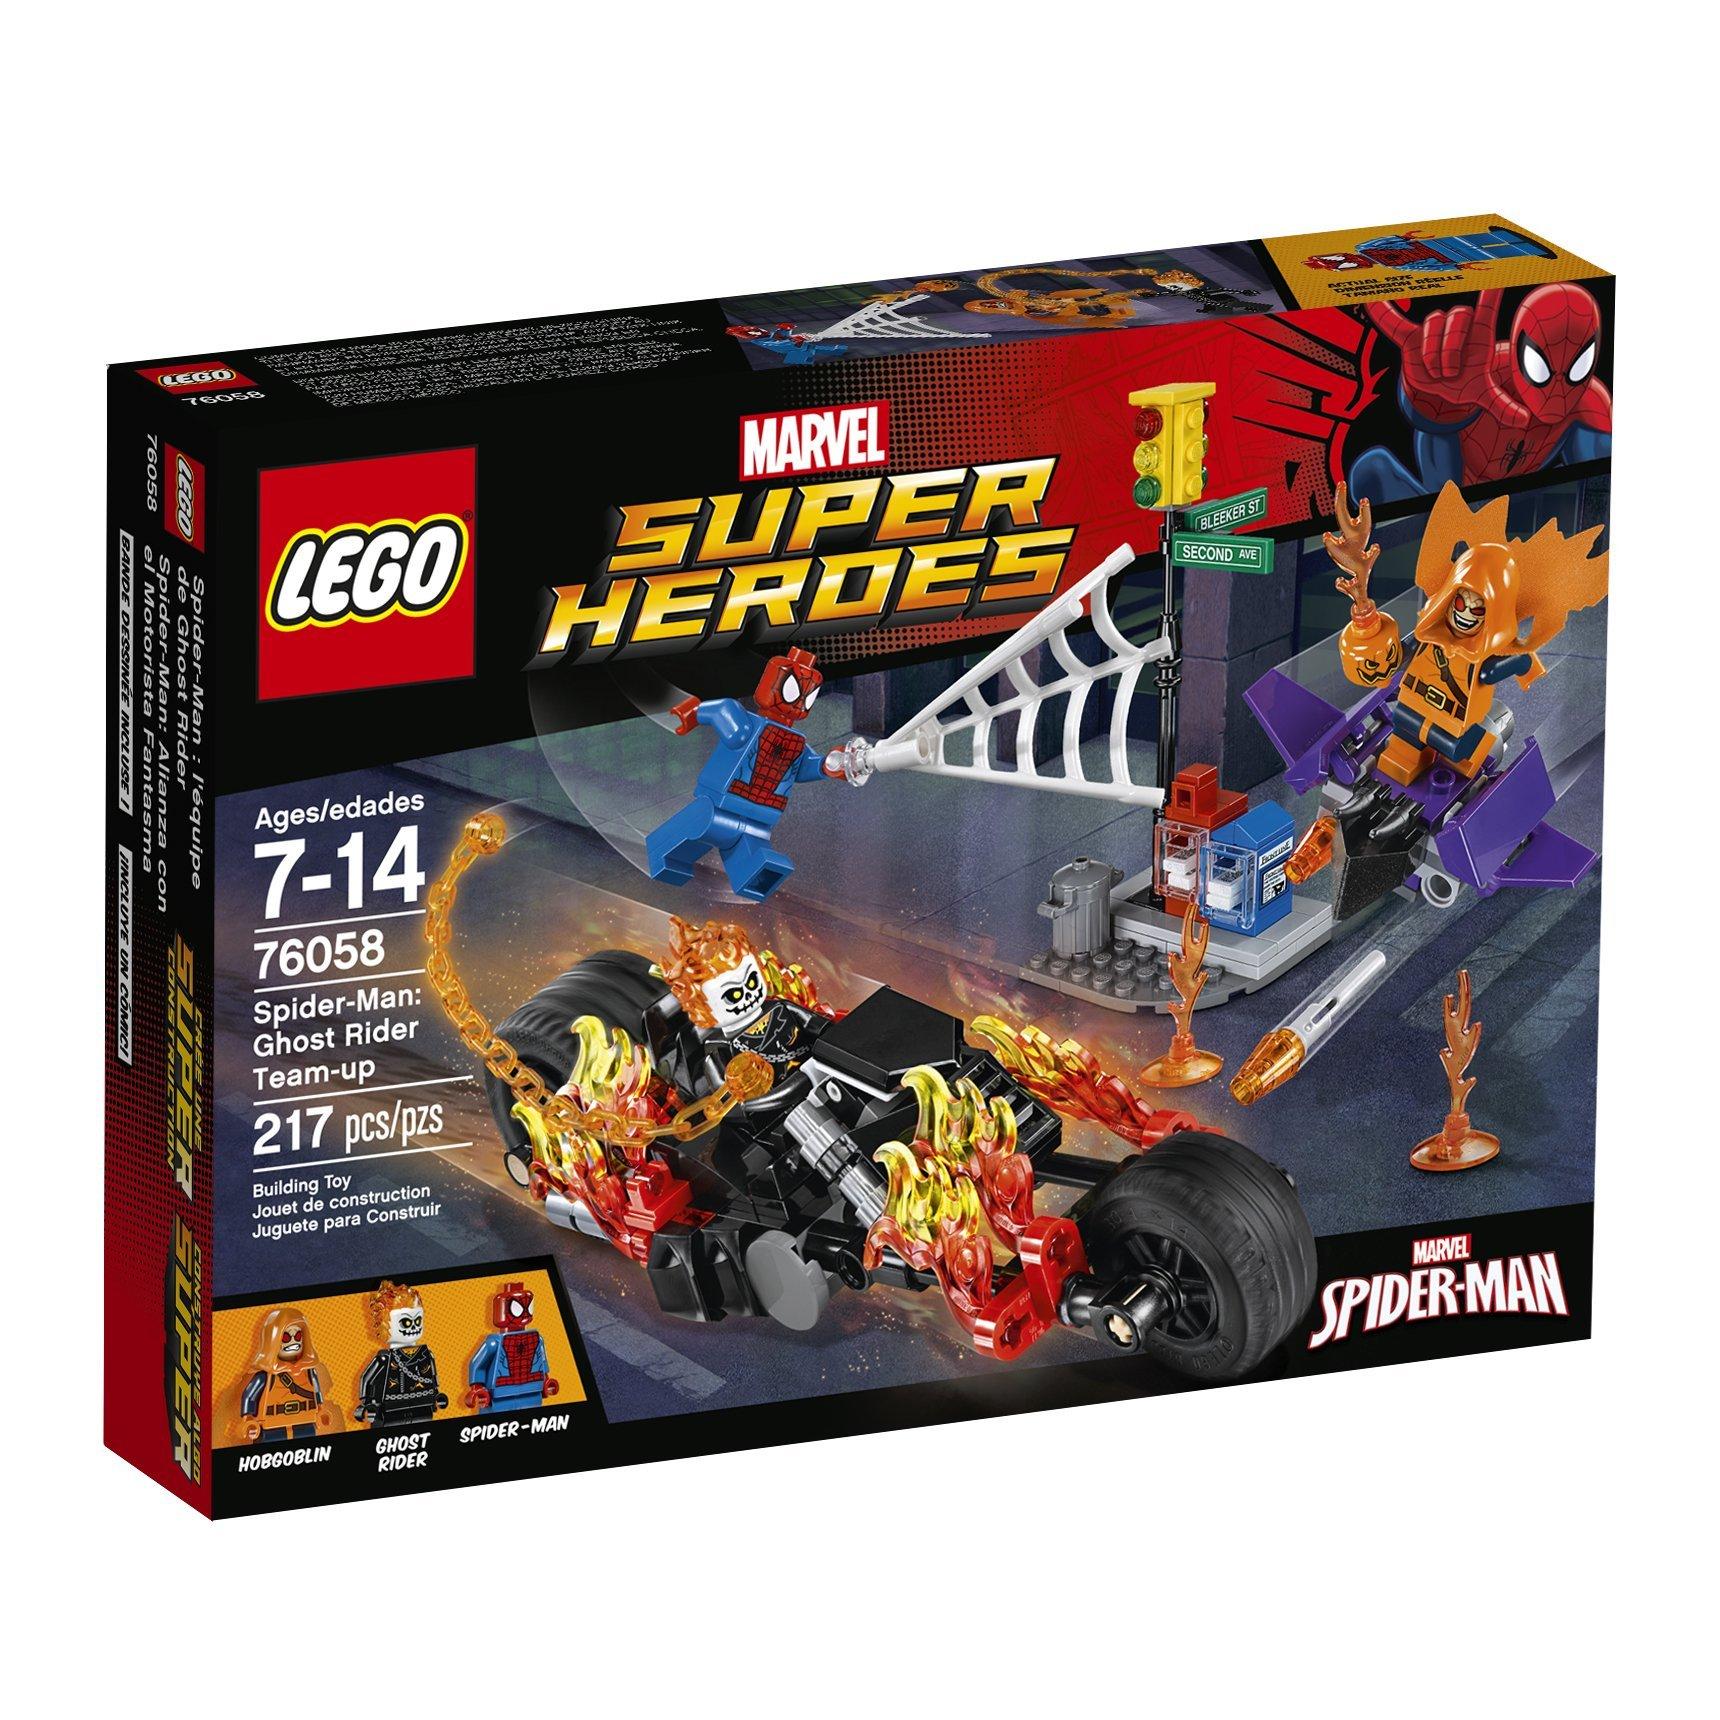 Lego Super Heroes 76058 Spider-Man: Ghost Rider Team-Up Building Kit (217 Pie.. 18